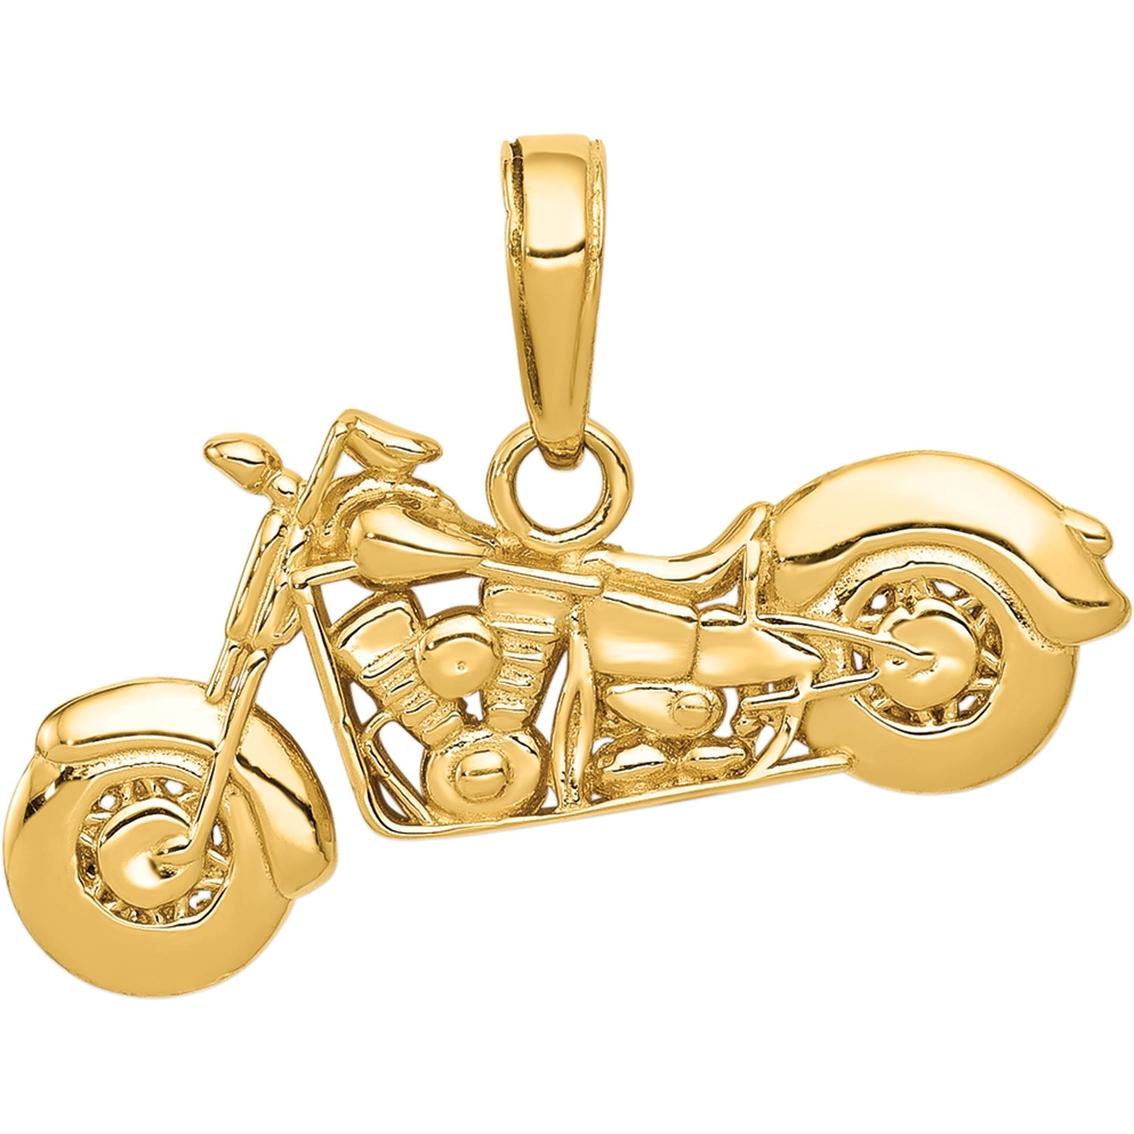 14k Yellow Gold Polished Little Boy Textured Back Flat Charm Pendant